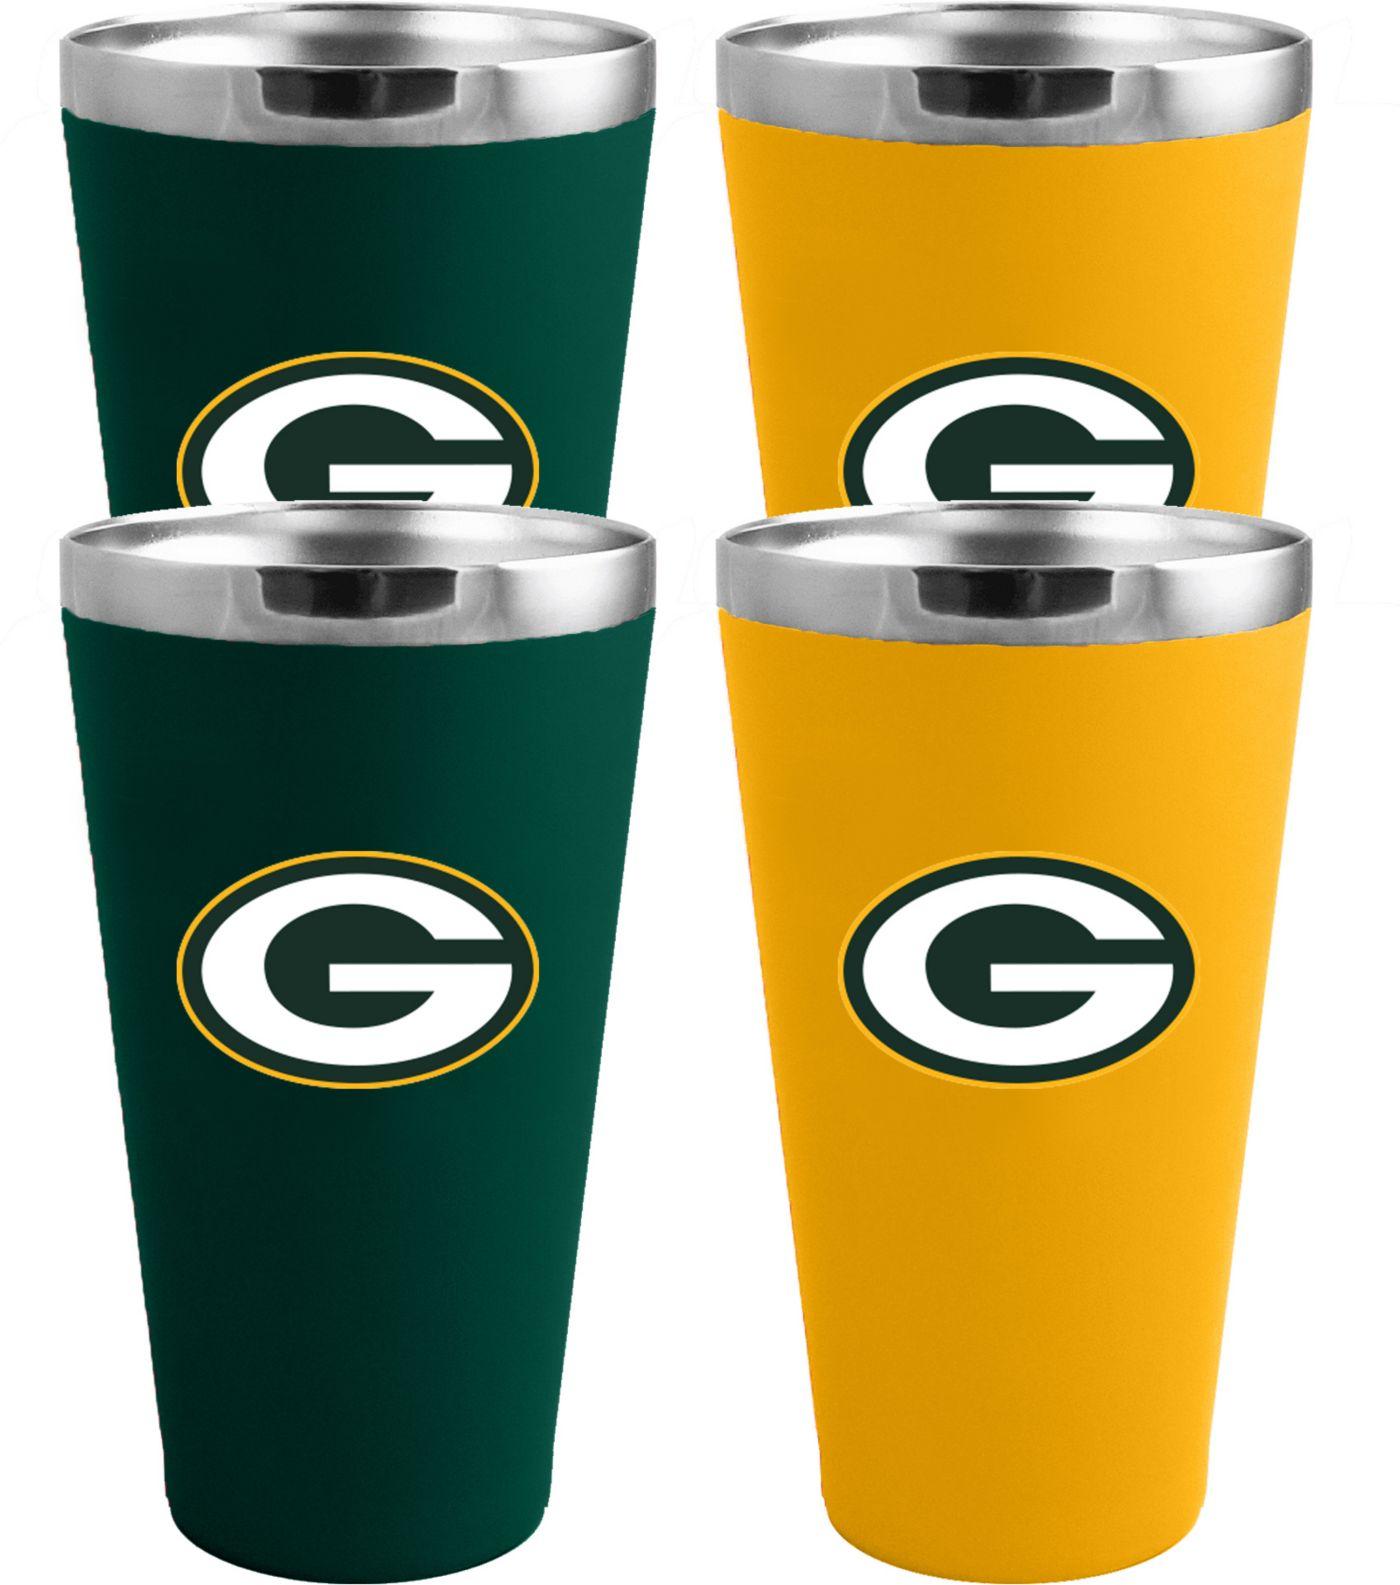 Memory Company Green Bay Packers 4 Pack Drinkware Set